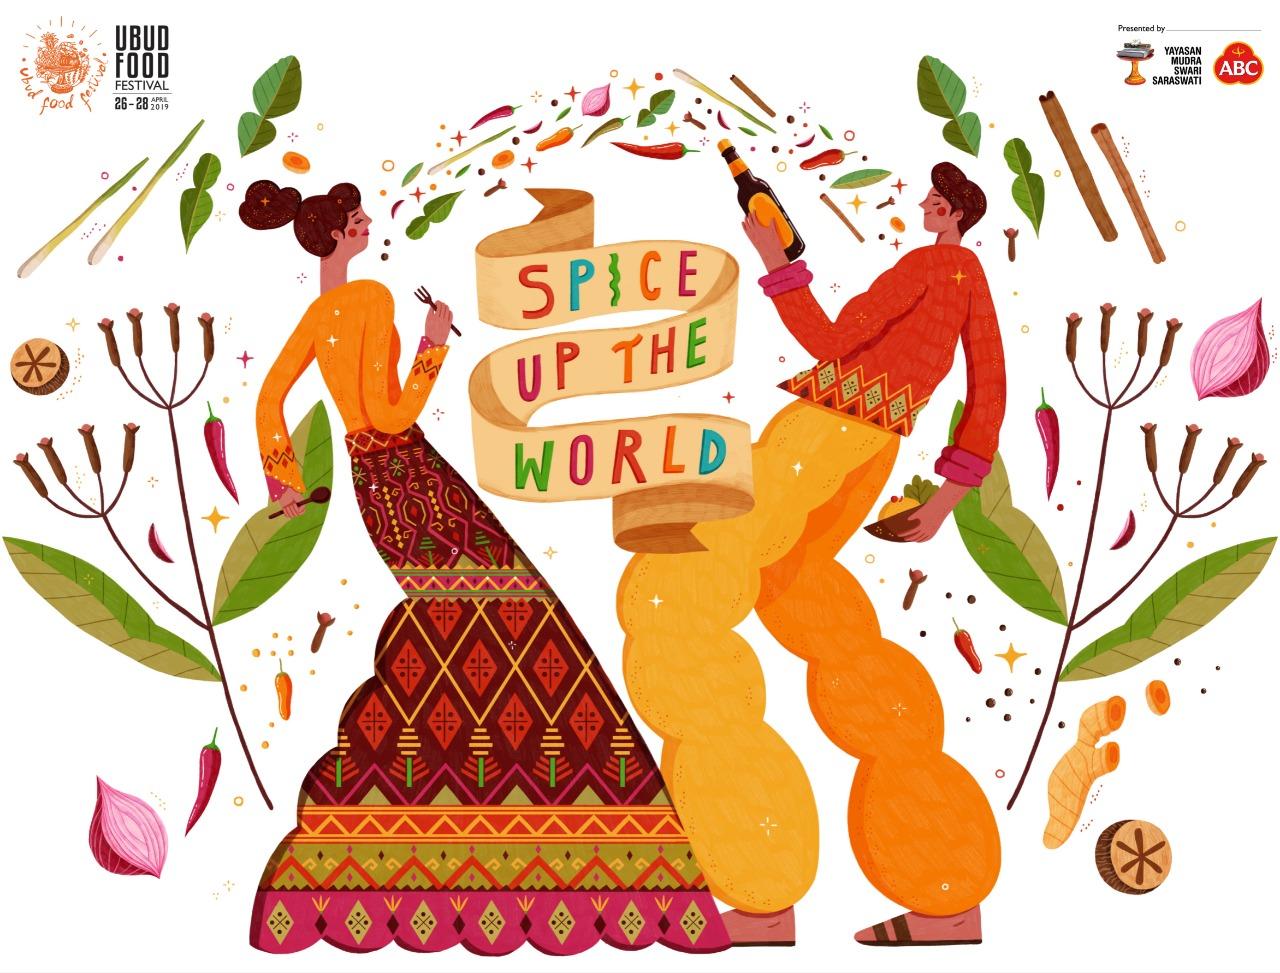 Ubud Food Festival 2019 yang bertajuk Spice Up The World | Sumber: Ubud Food Festival